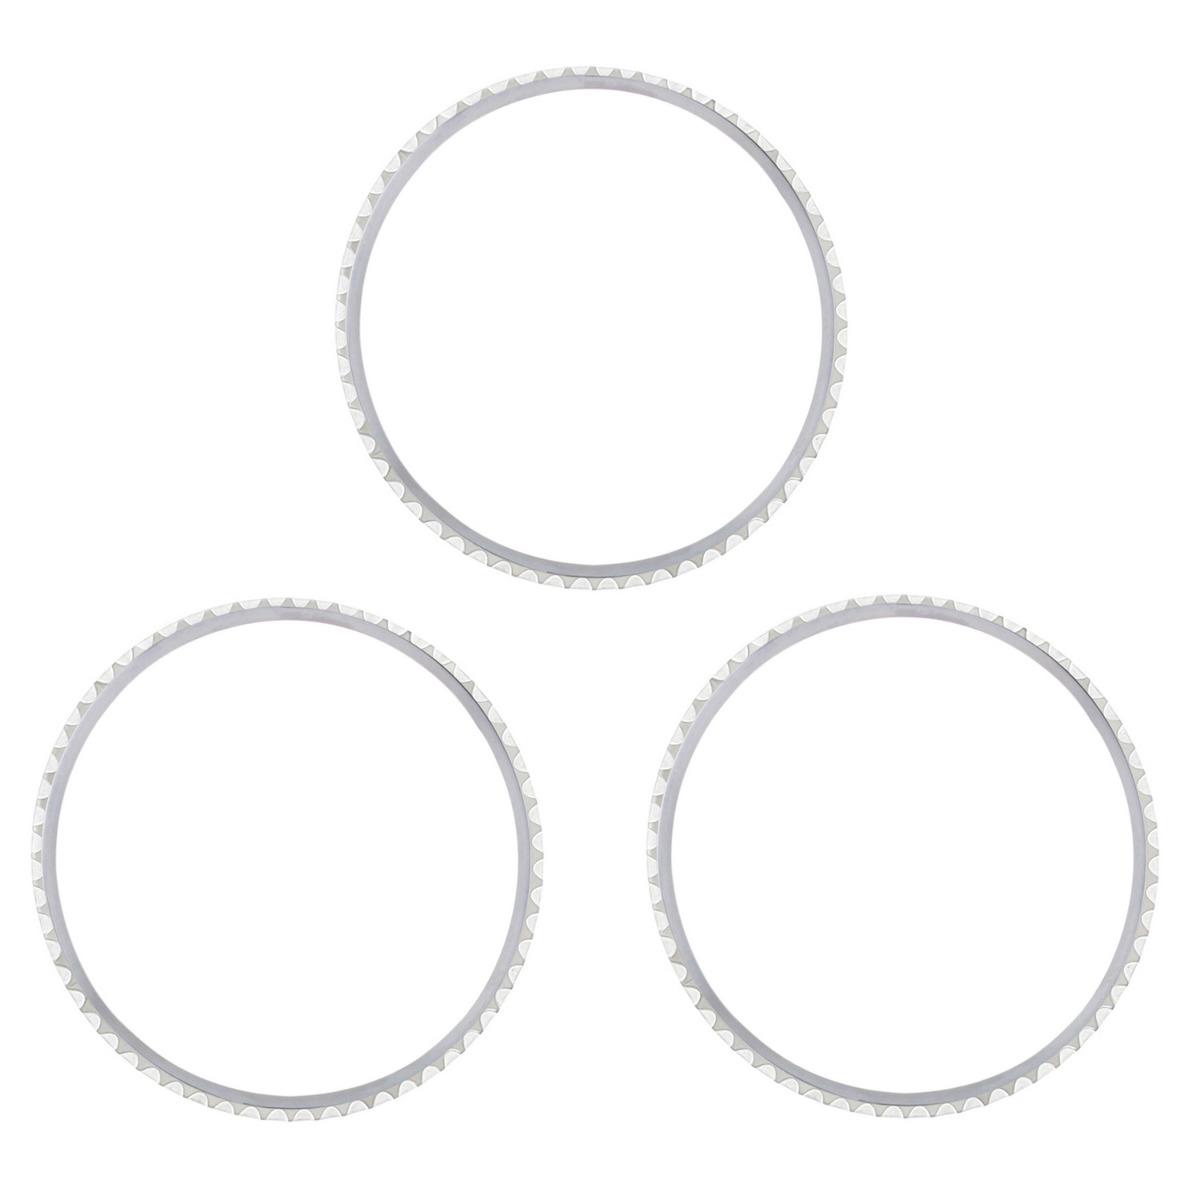 3 STEEL BEZEL RING INSERT FOR OLDER ROLEX 1680 5508 5512 5513 5517 WATCH MODELS